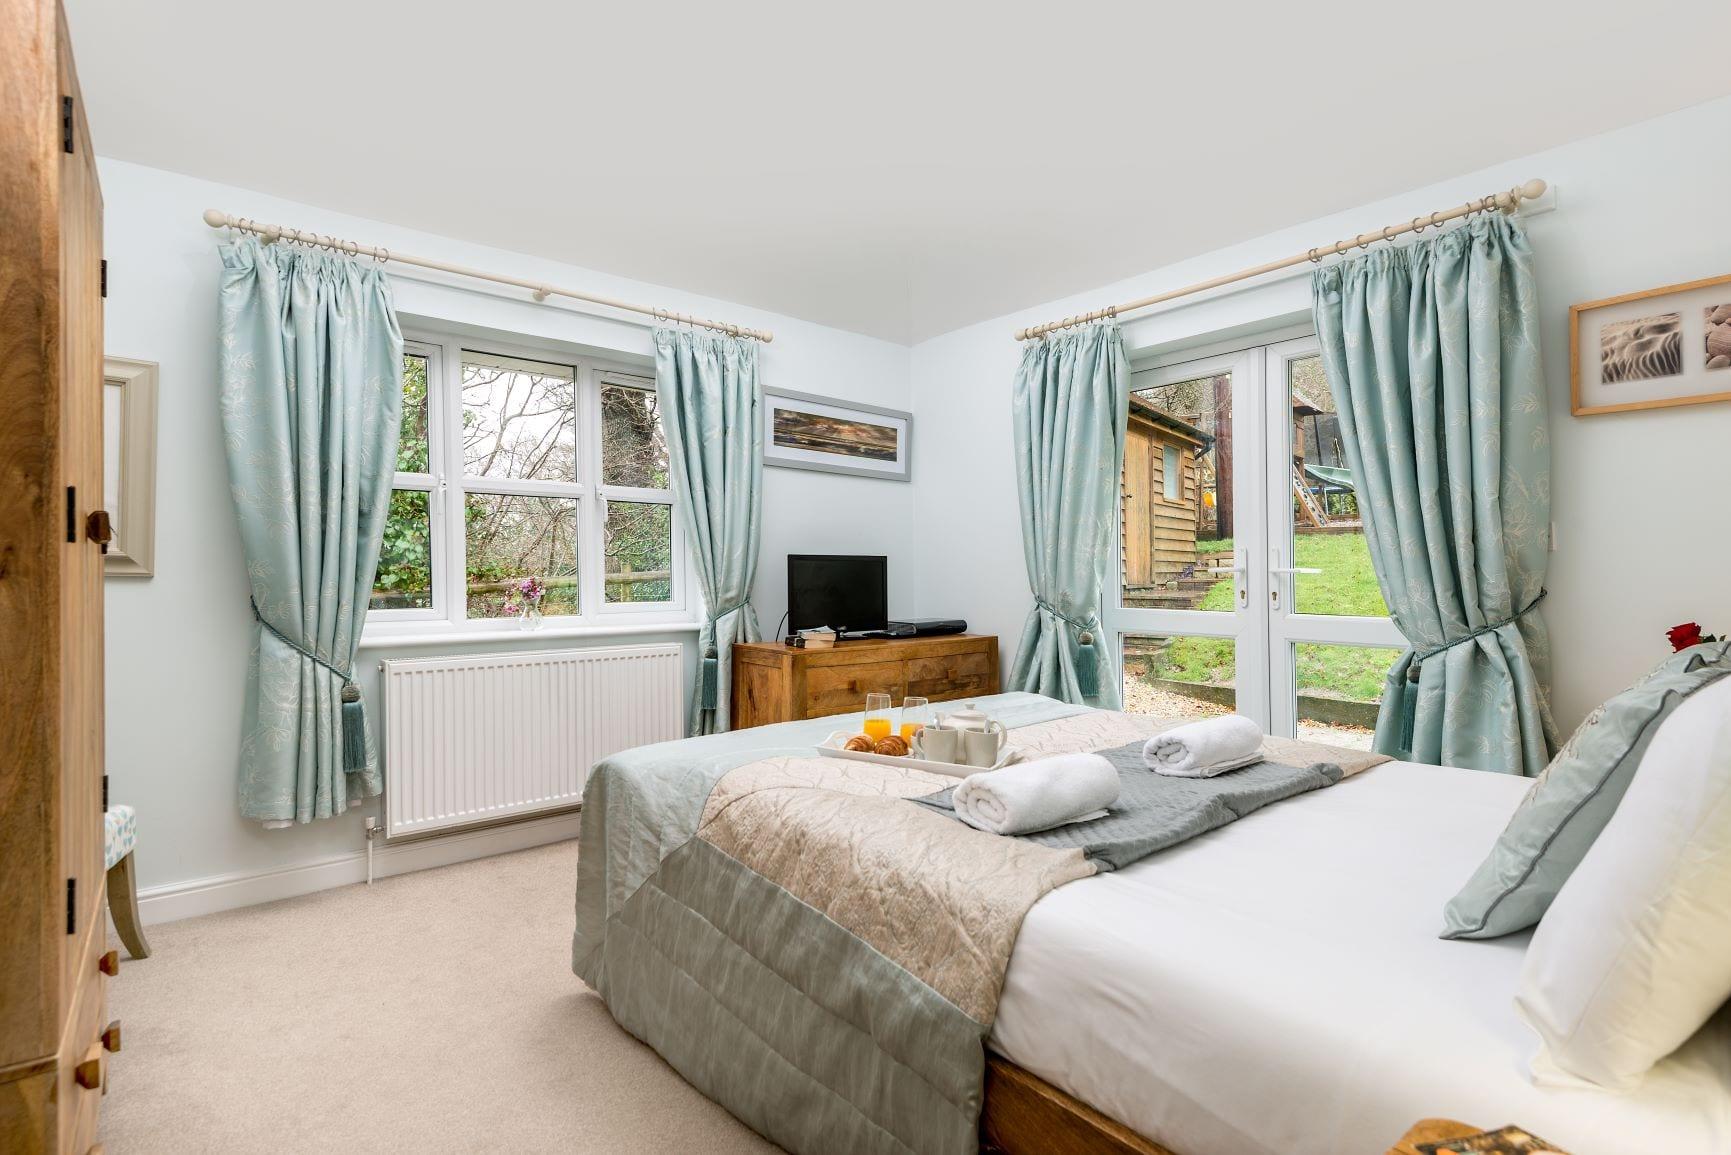 Mews Hill Cottage, Ground Floor King Size bedroom